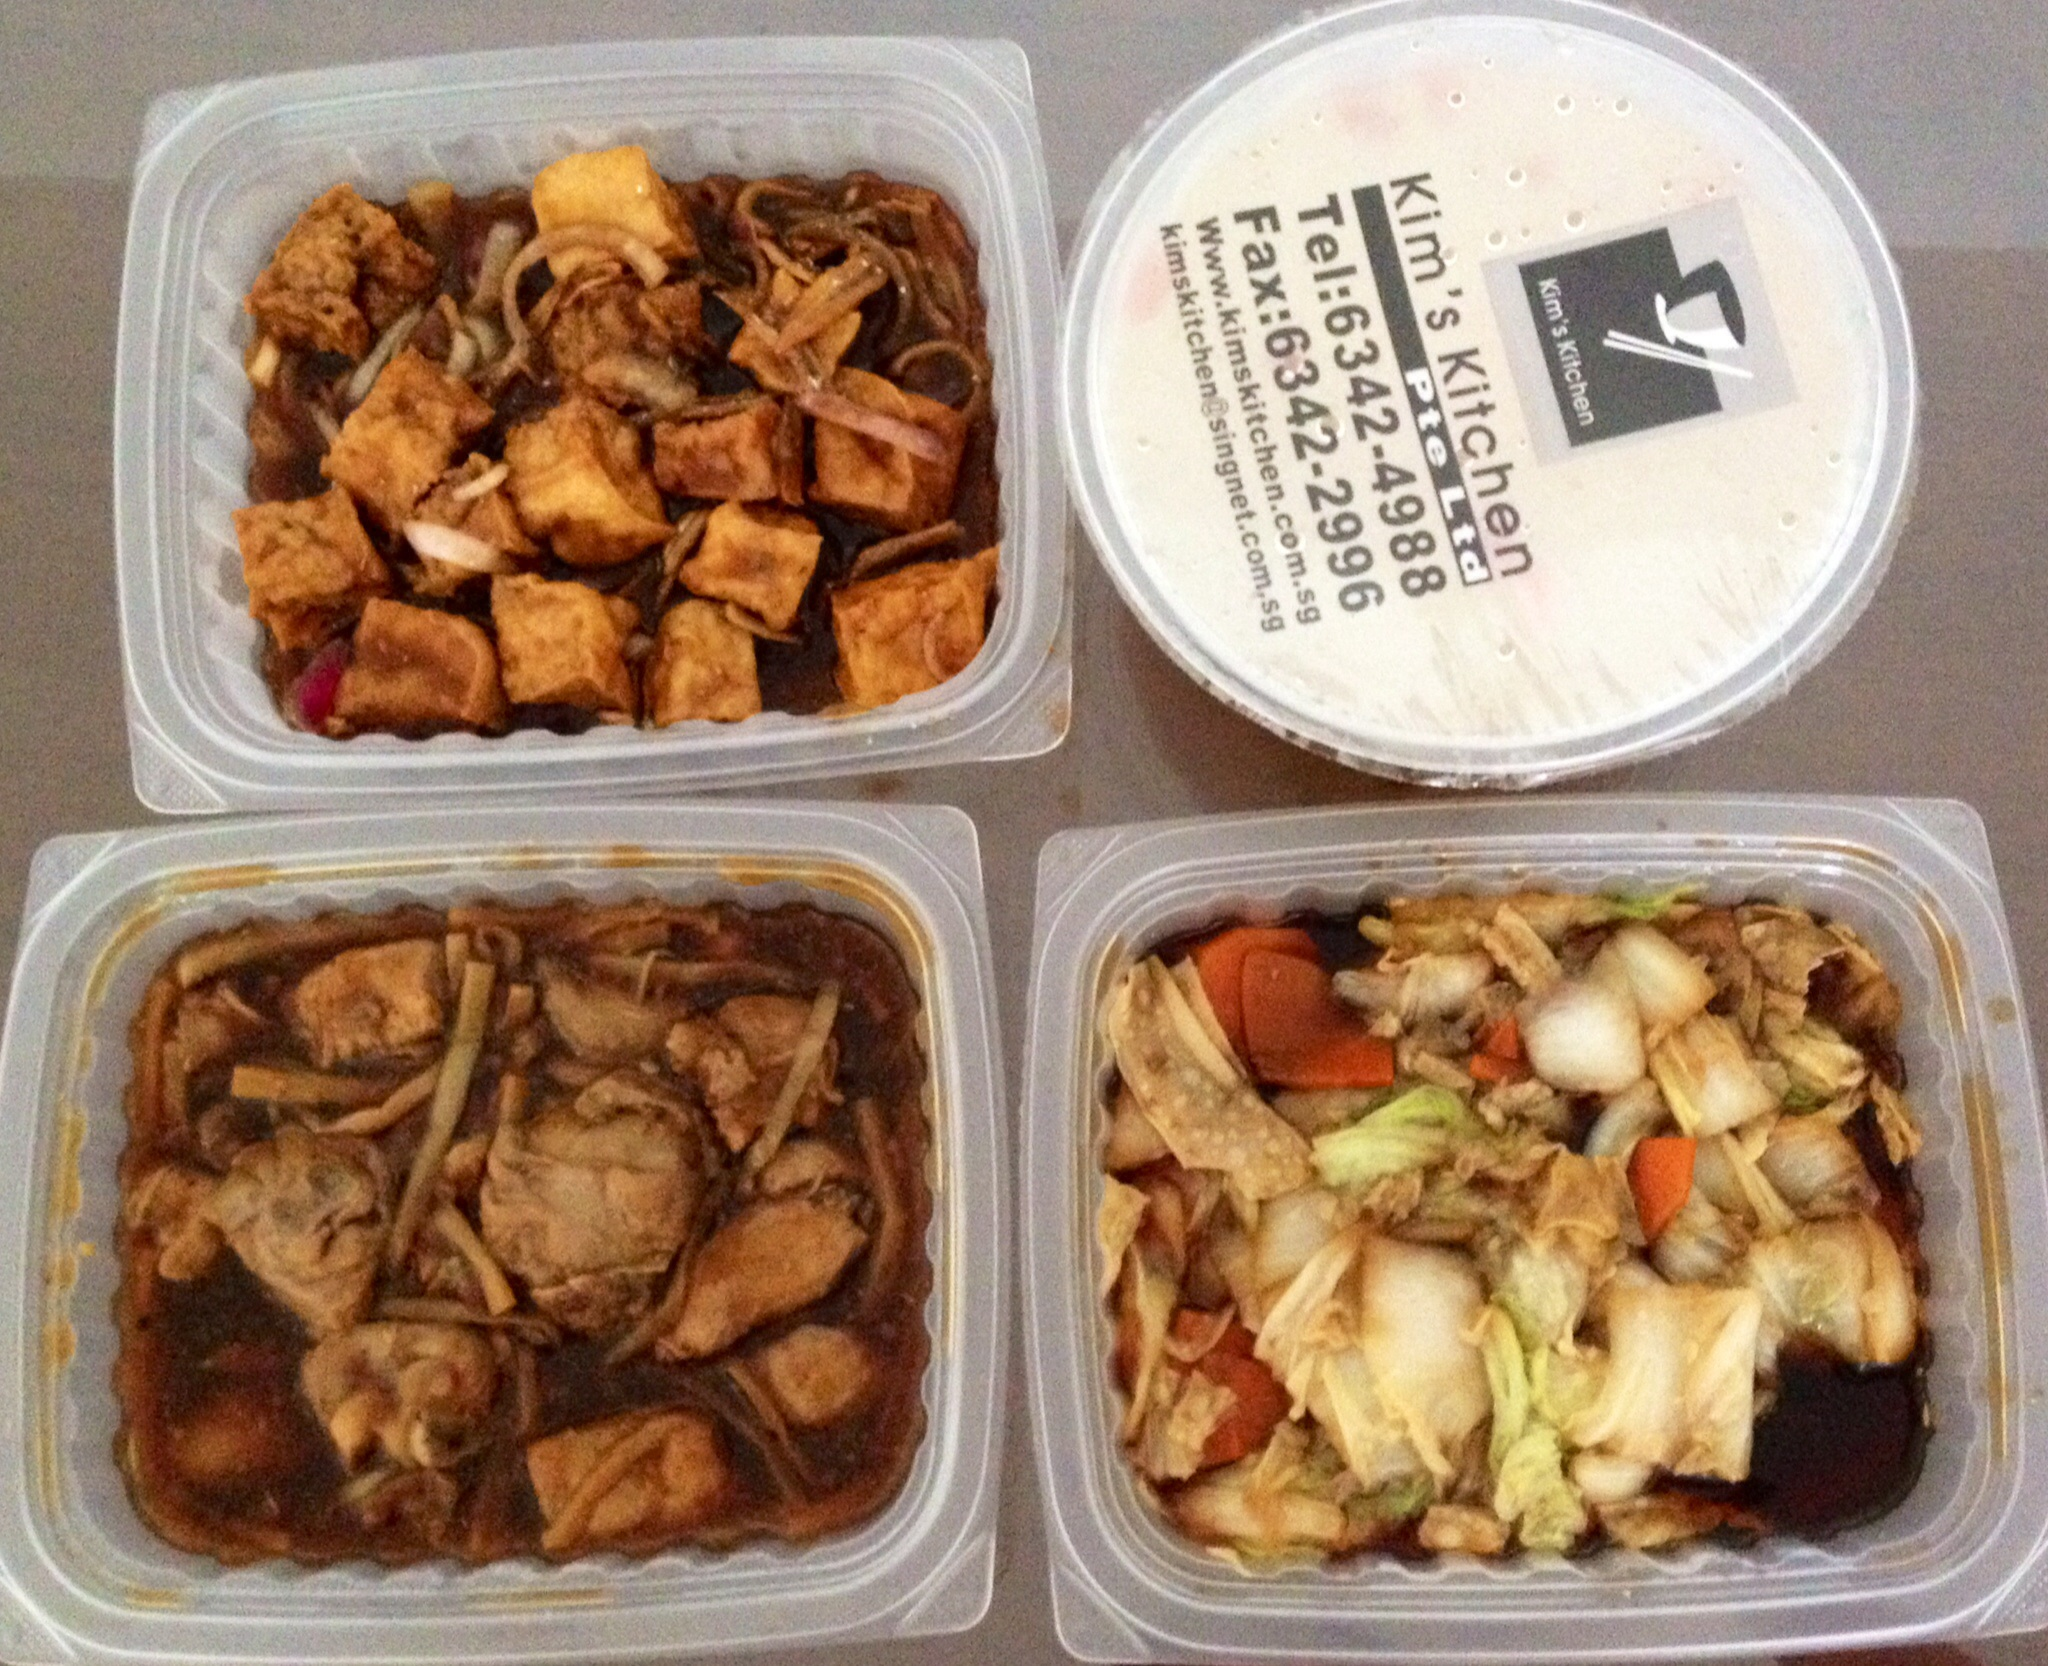 Tingkat Delivery Kim S Kitchen Jrehmembrance